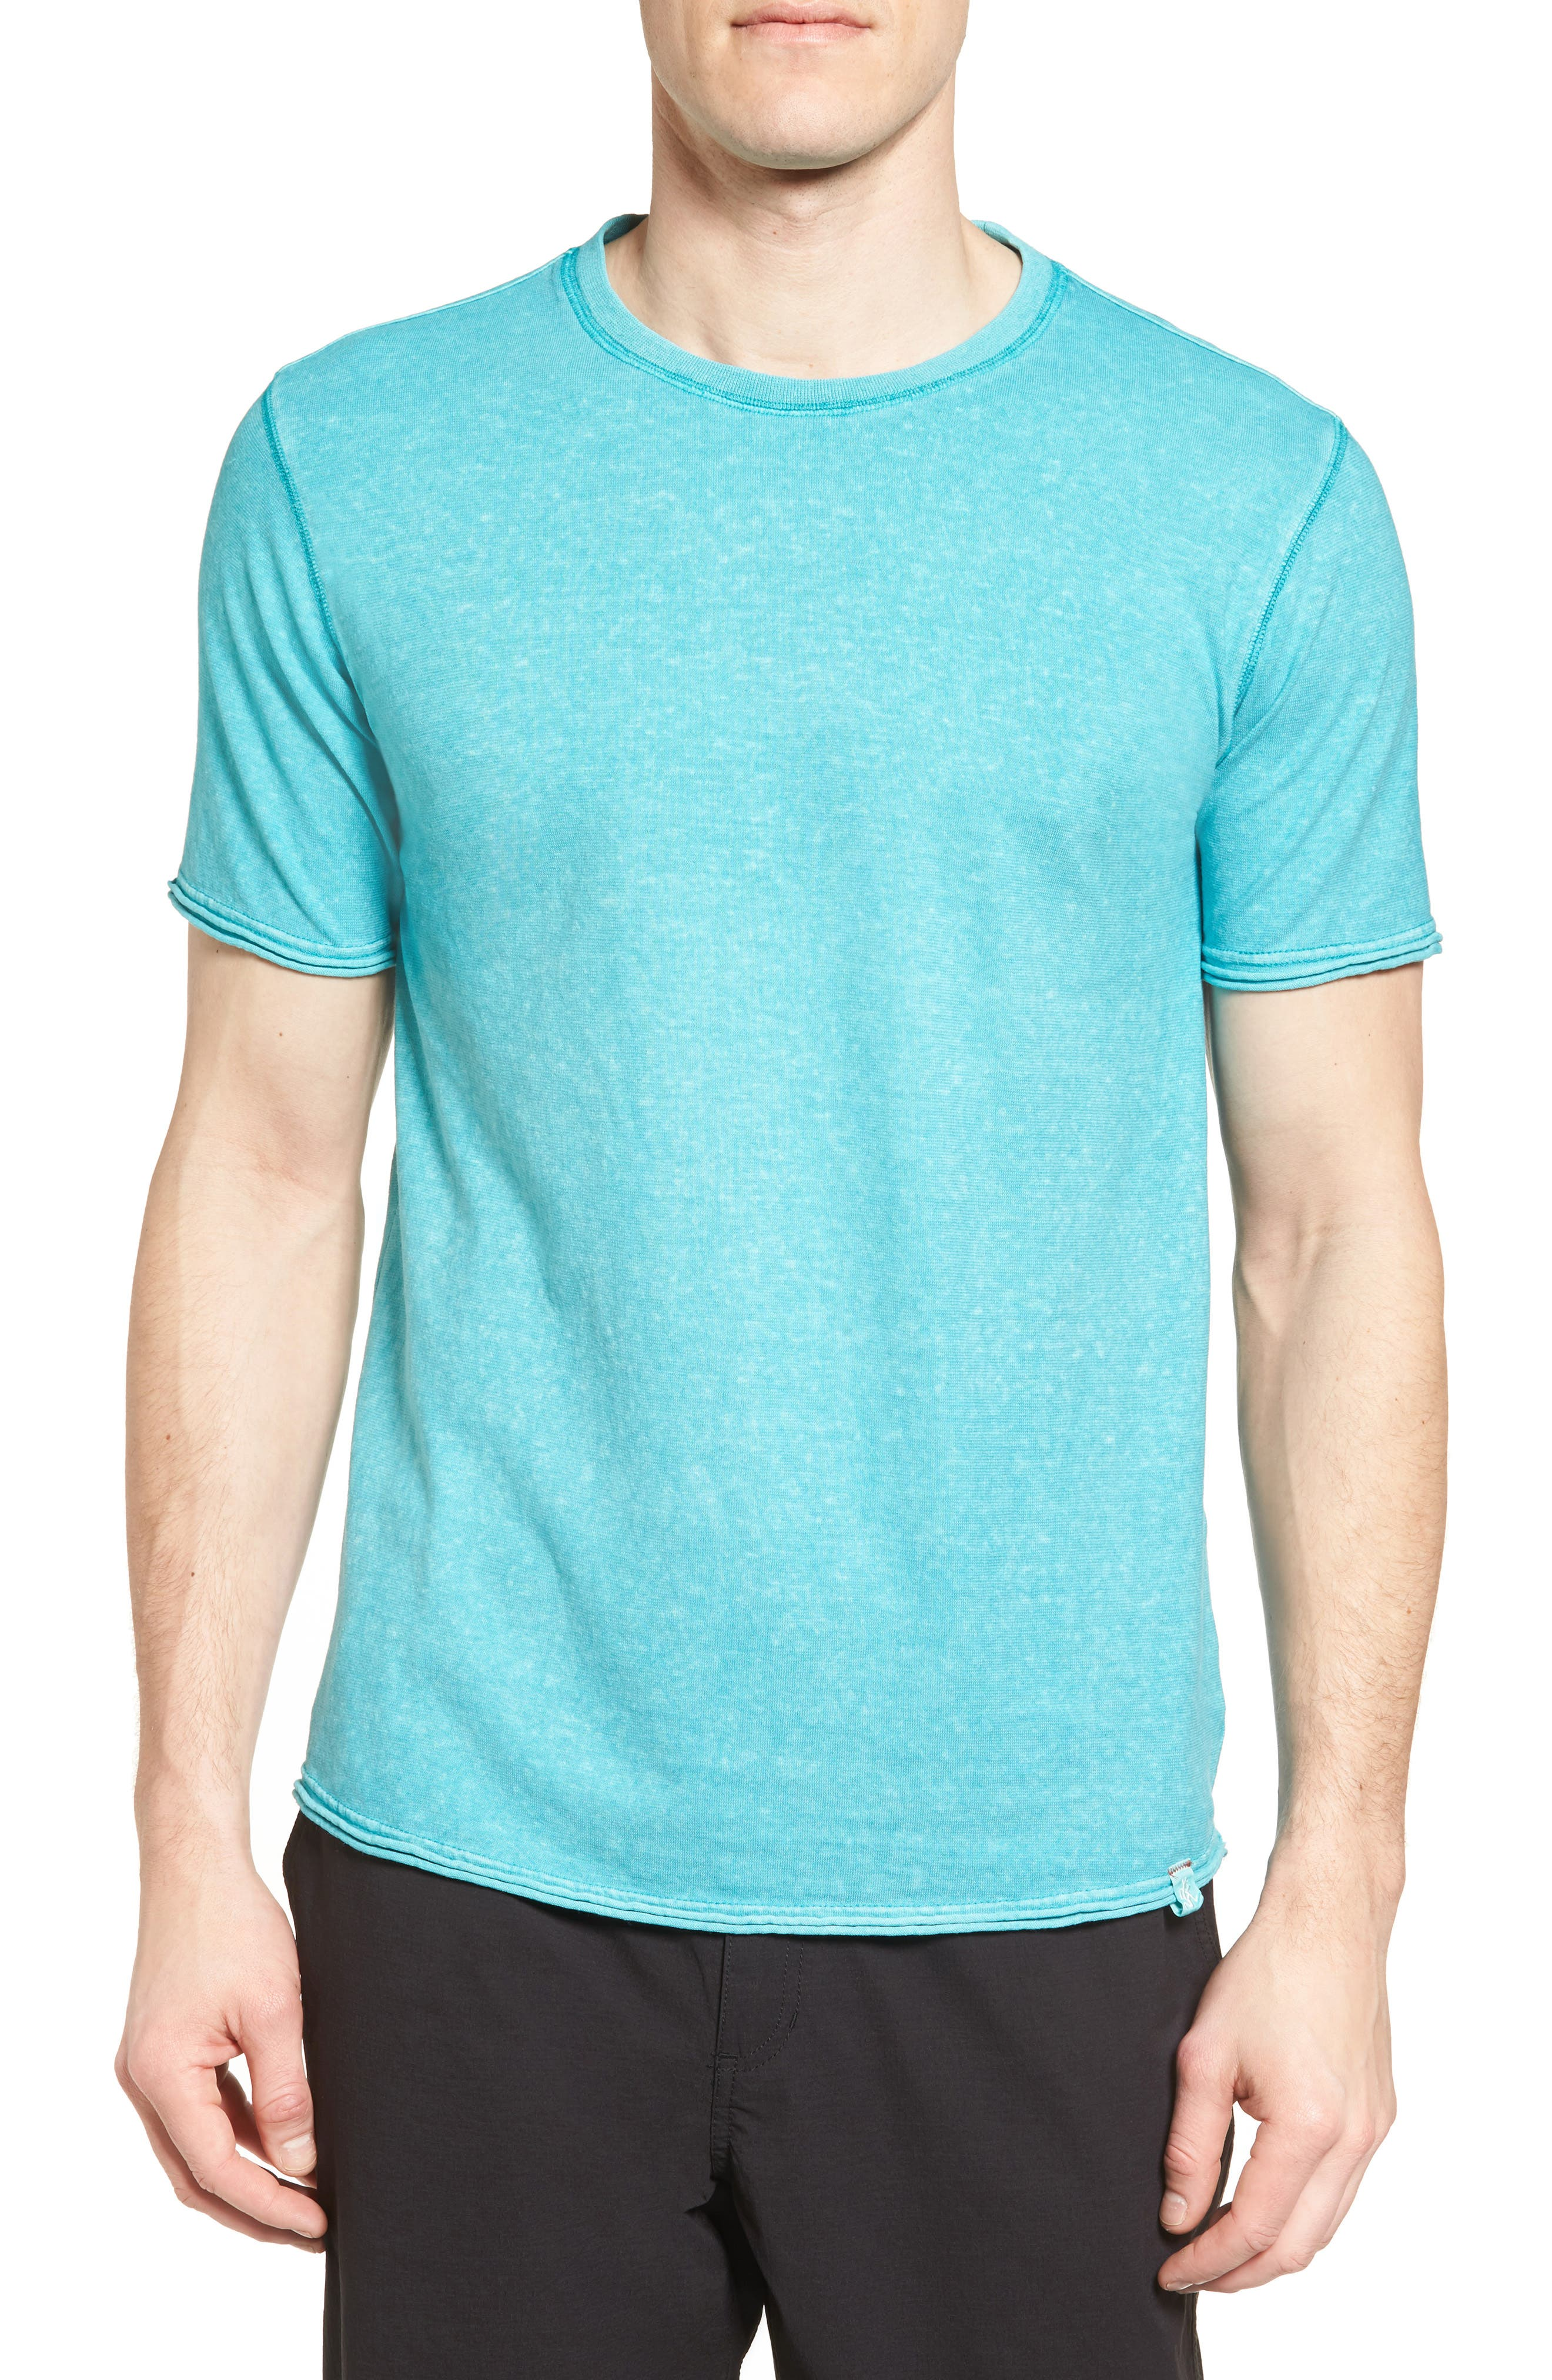 Camura T-Shirt,                             Main thumbnail 1, color,                             Fiji Blue